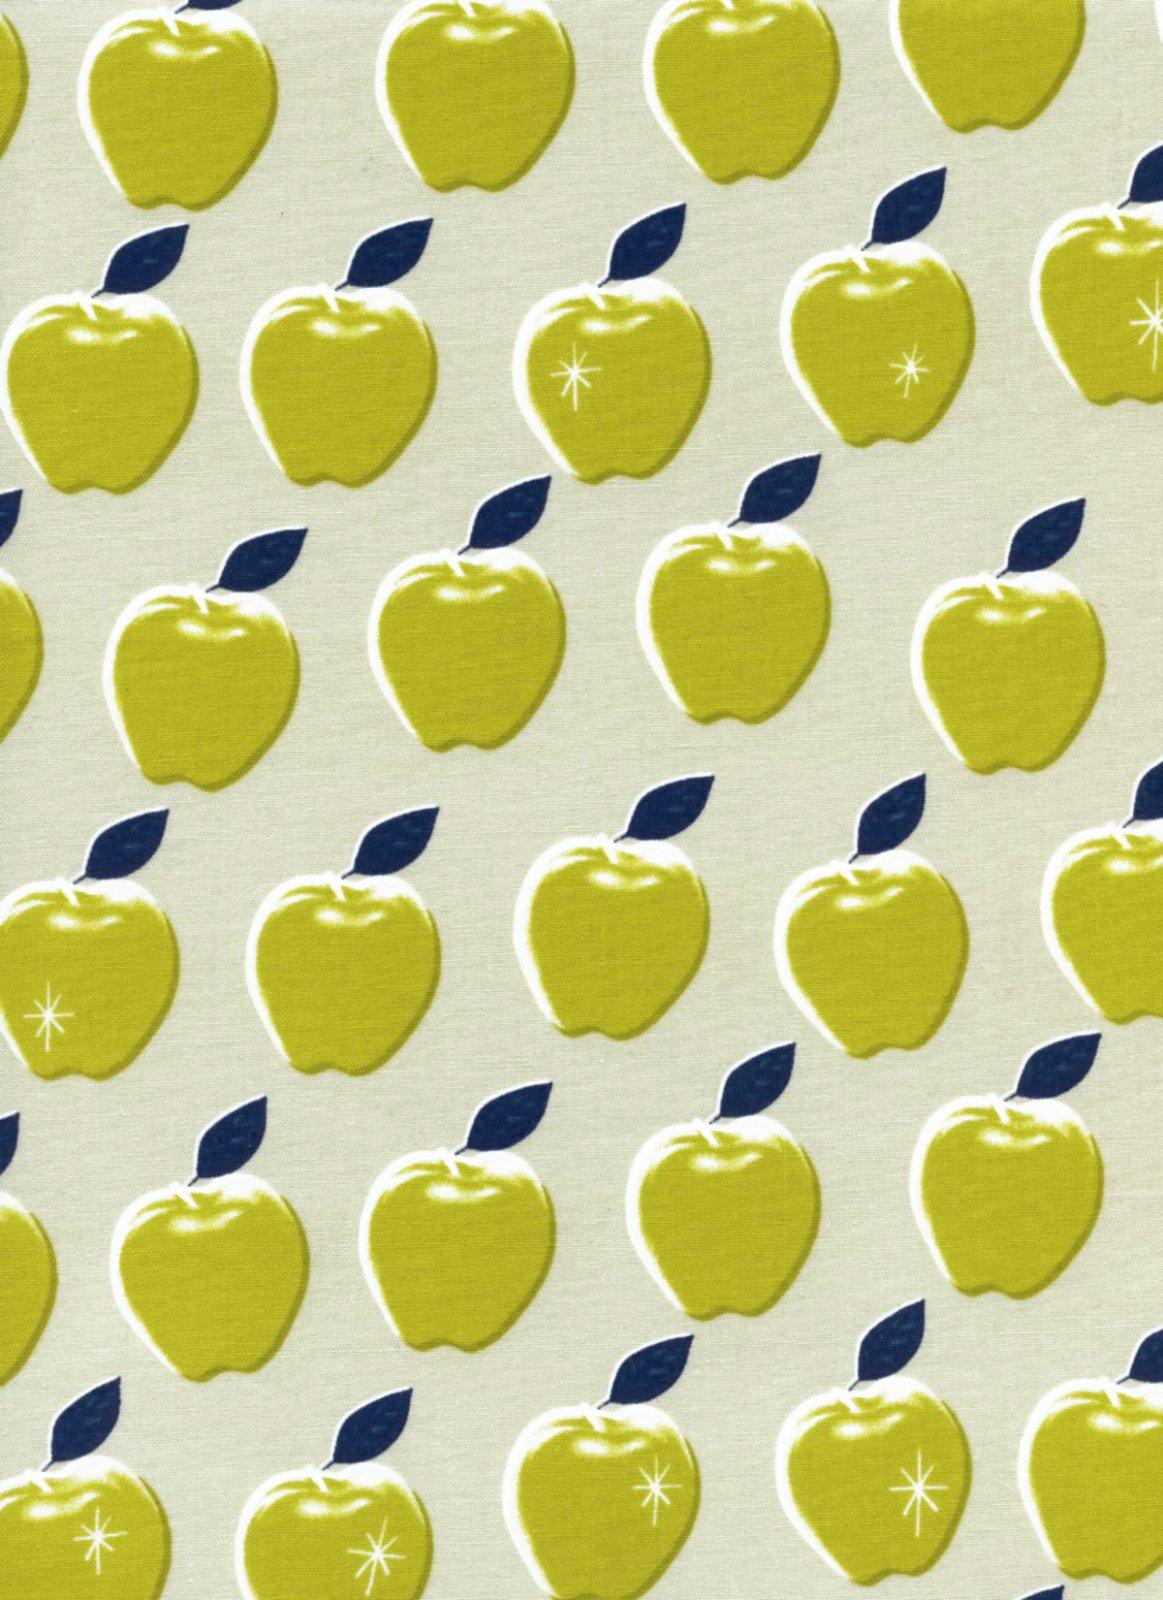 Apples in Citron